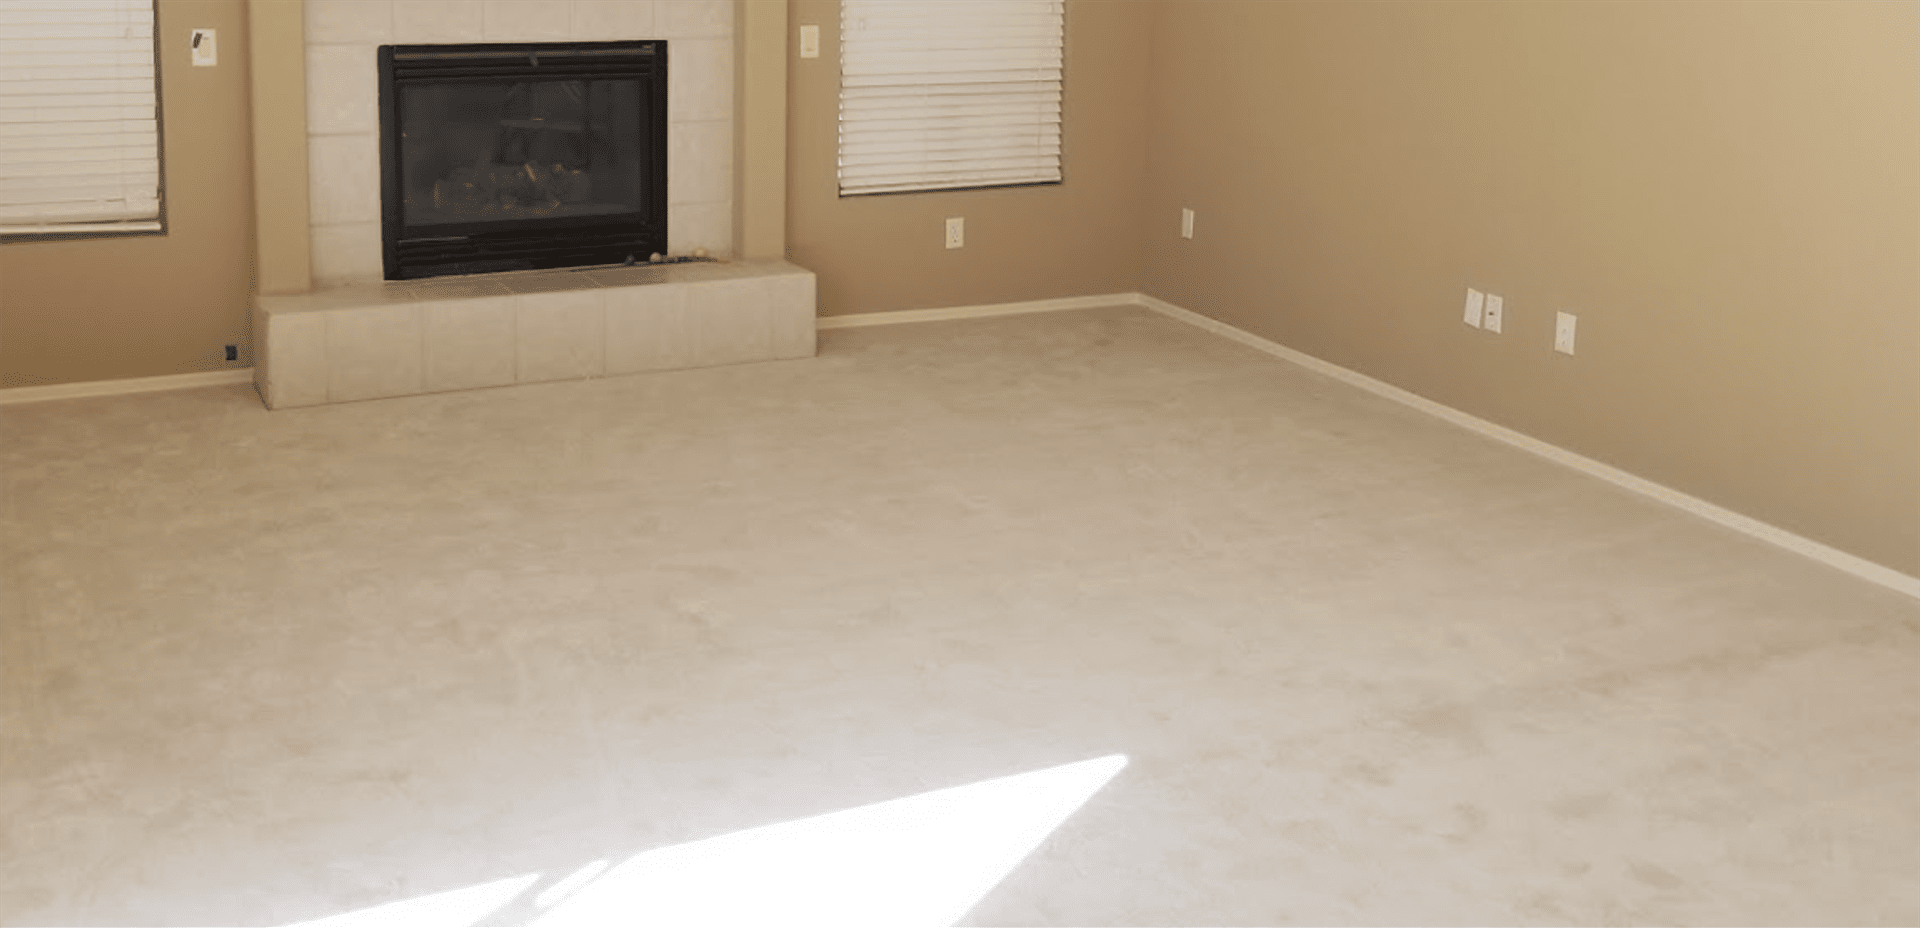 Carpet flooring from Taylors Flooring in Chandler, AZ